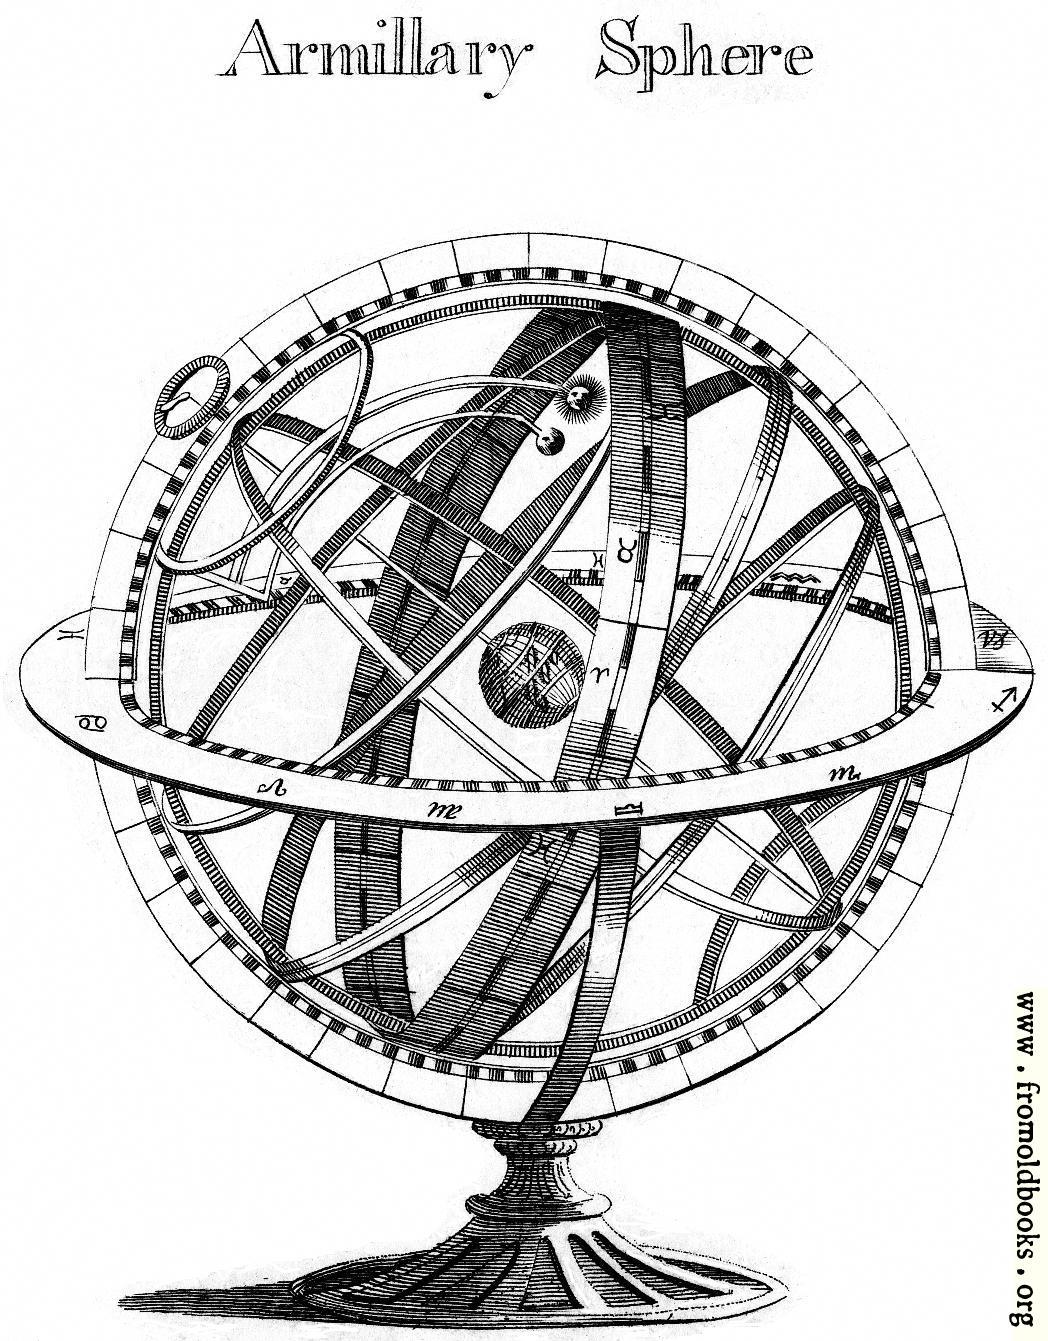 21 Armillary Sphere